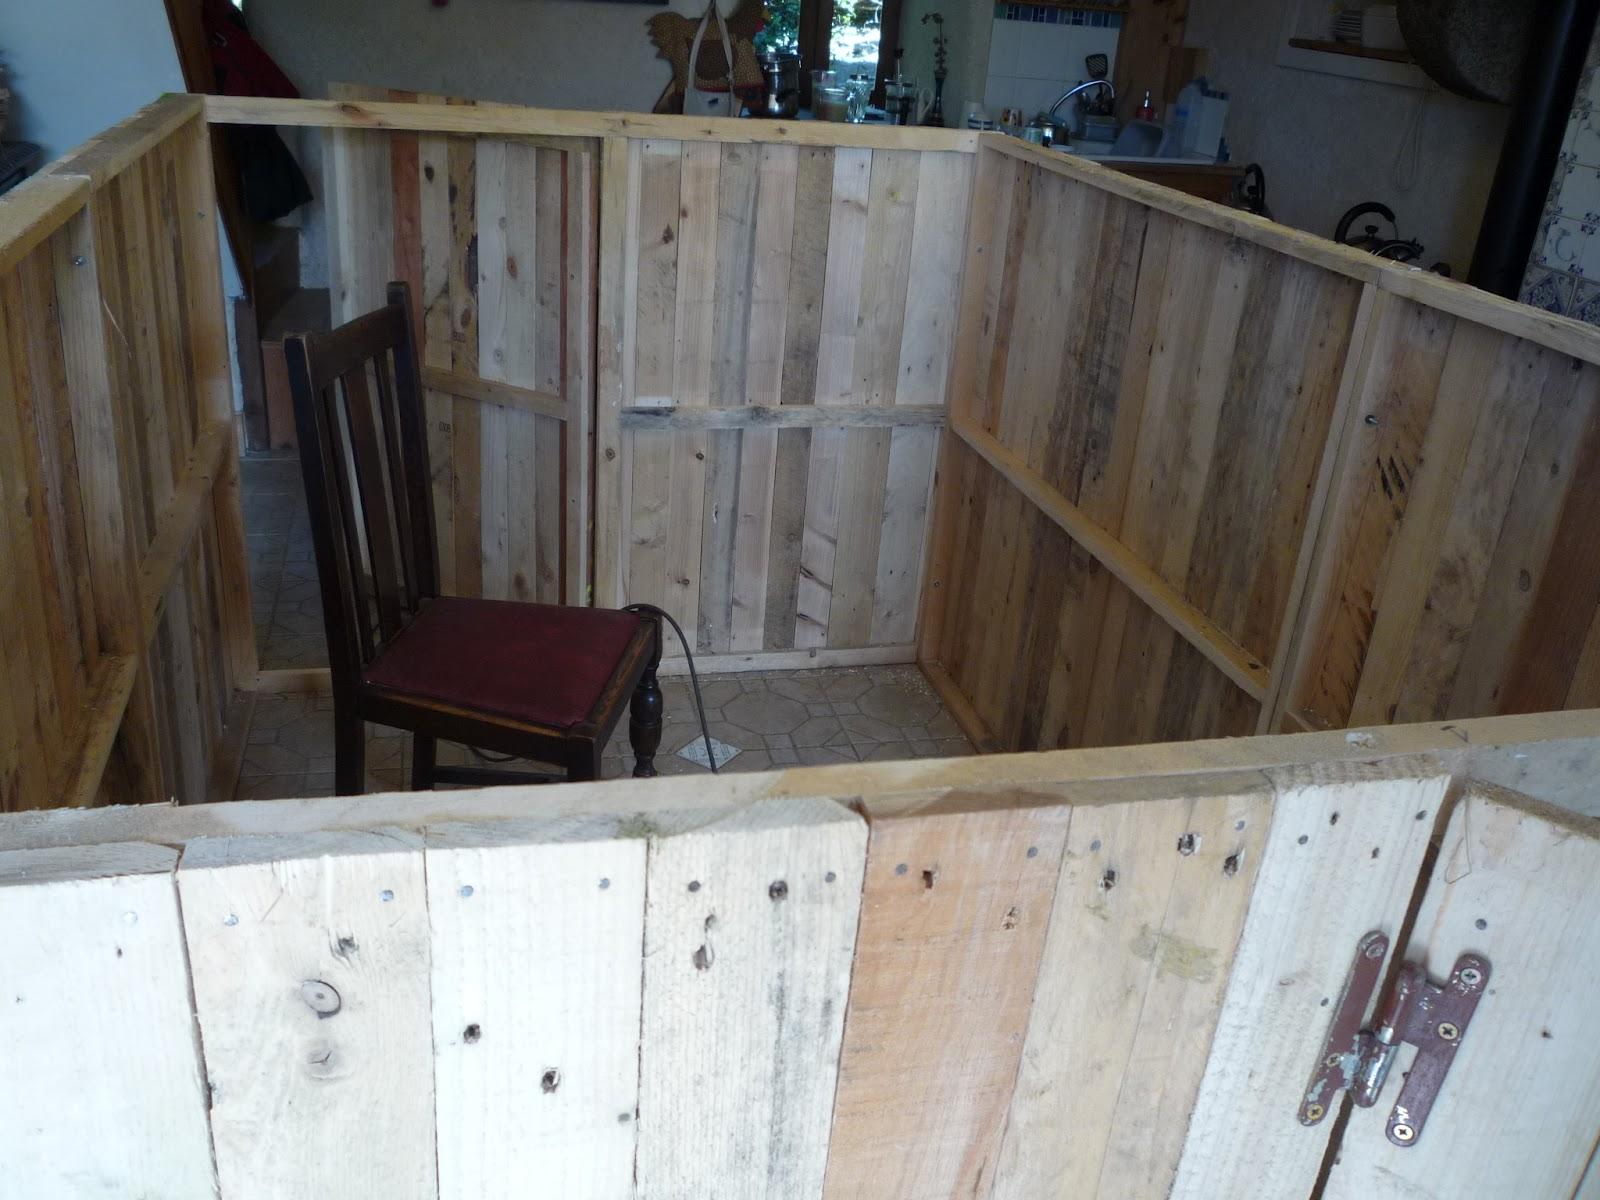 DIY Pallet Wood Hen House Chicken Coop Part 3 - Assembly.